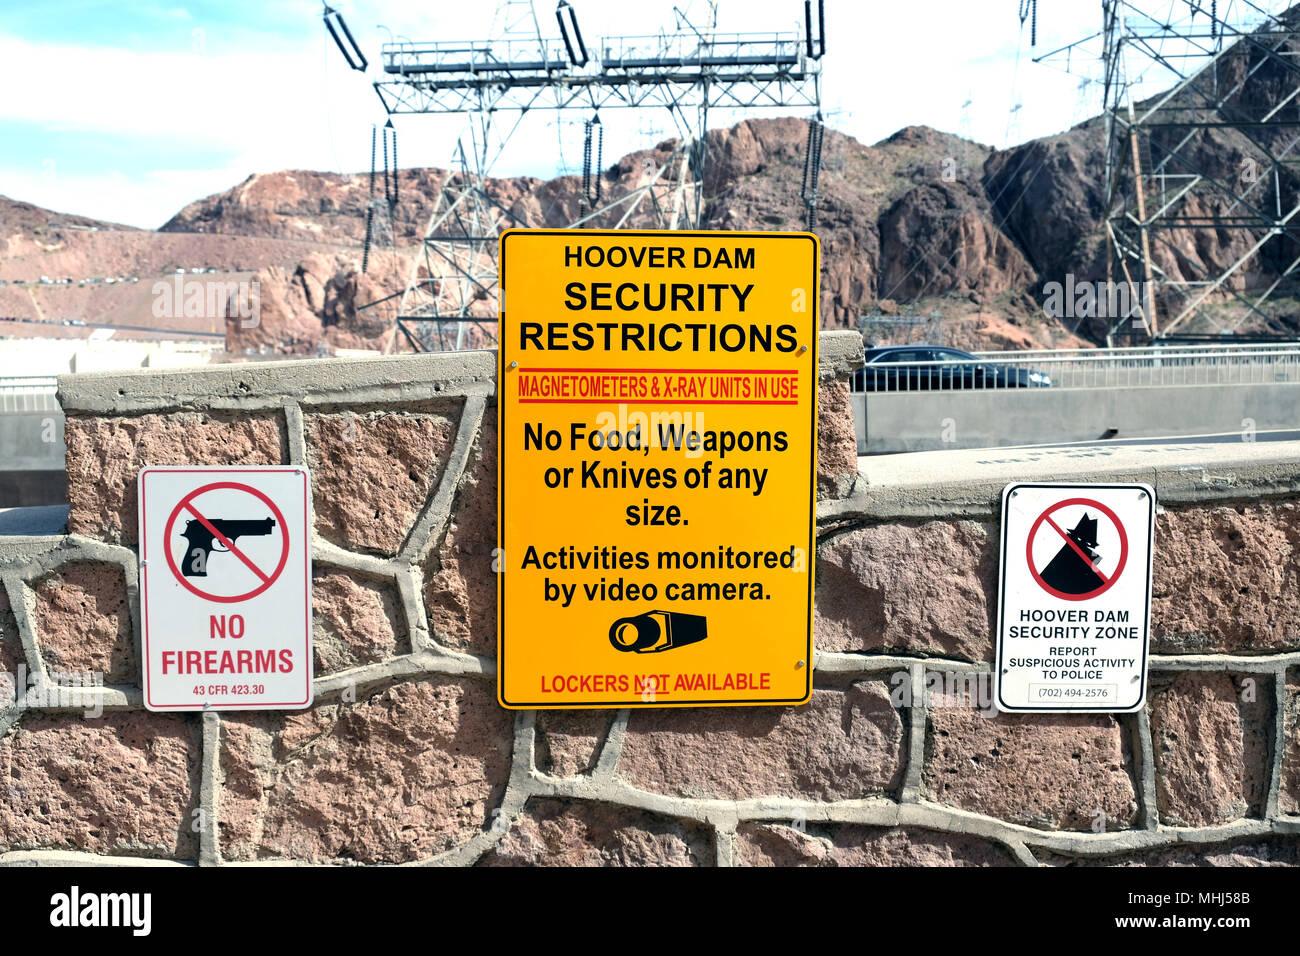 Hoover Dam Near Las Vegas Stock Photos & Hoover Dam Near Las Vegas